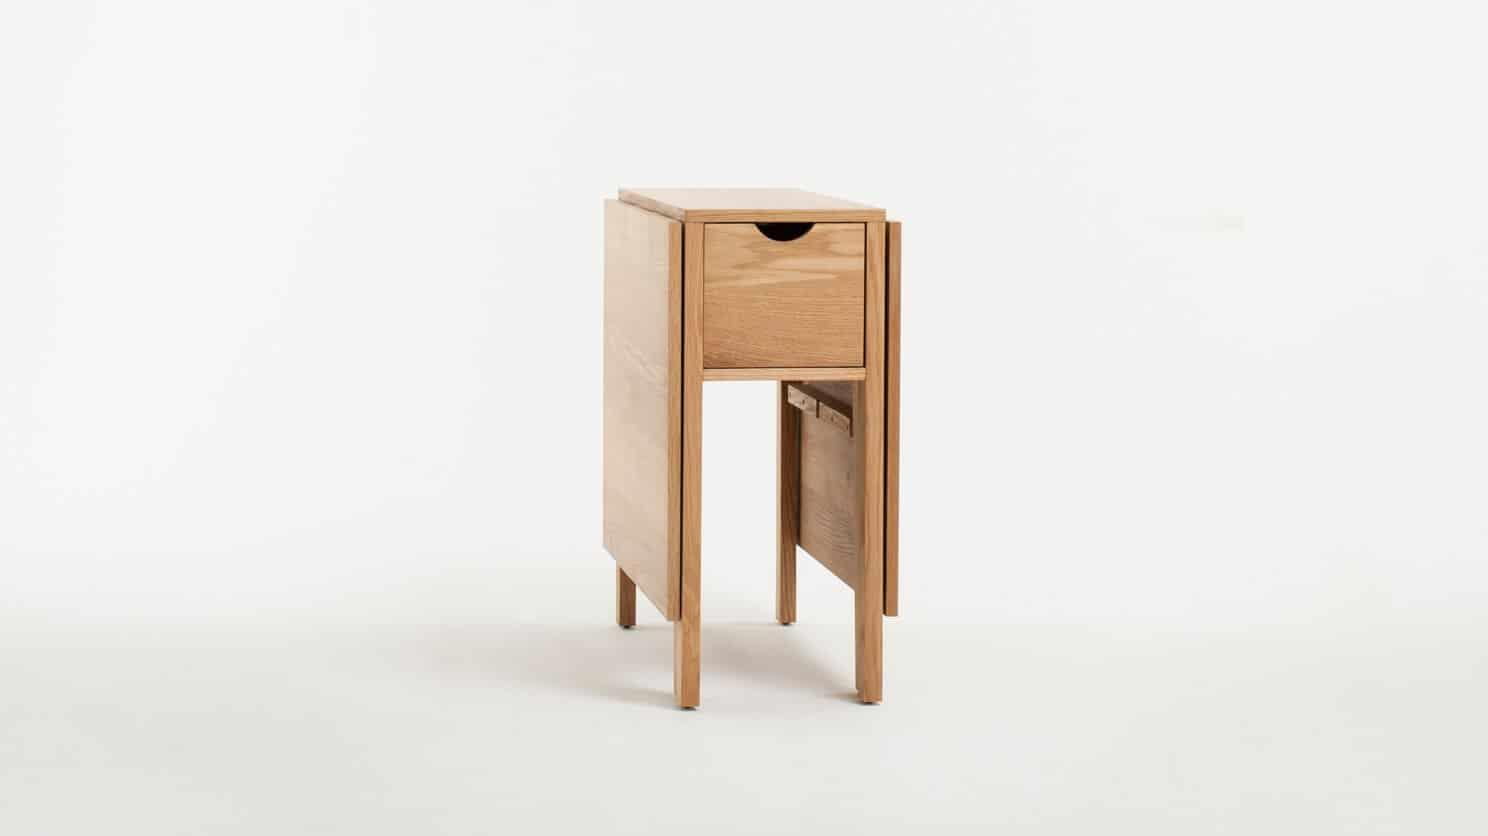 3020 377 par 3 dinette tables hallie folding table oak corner closed